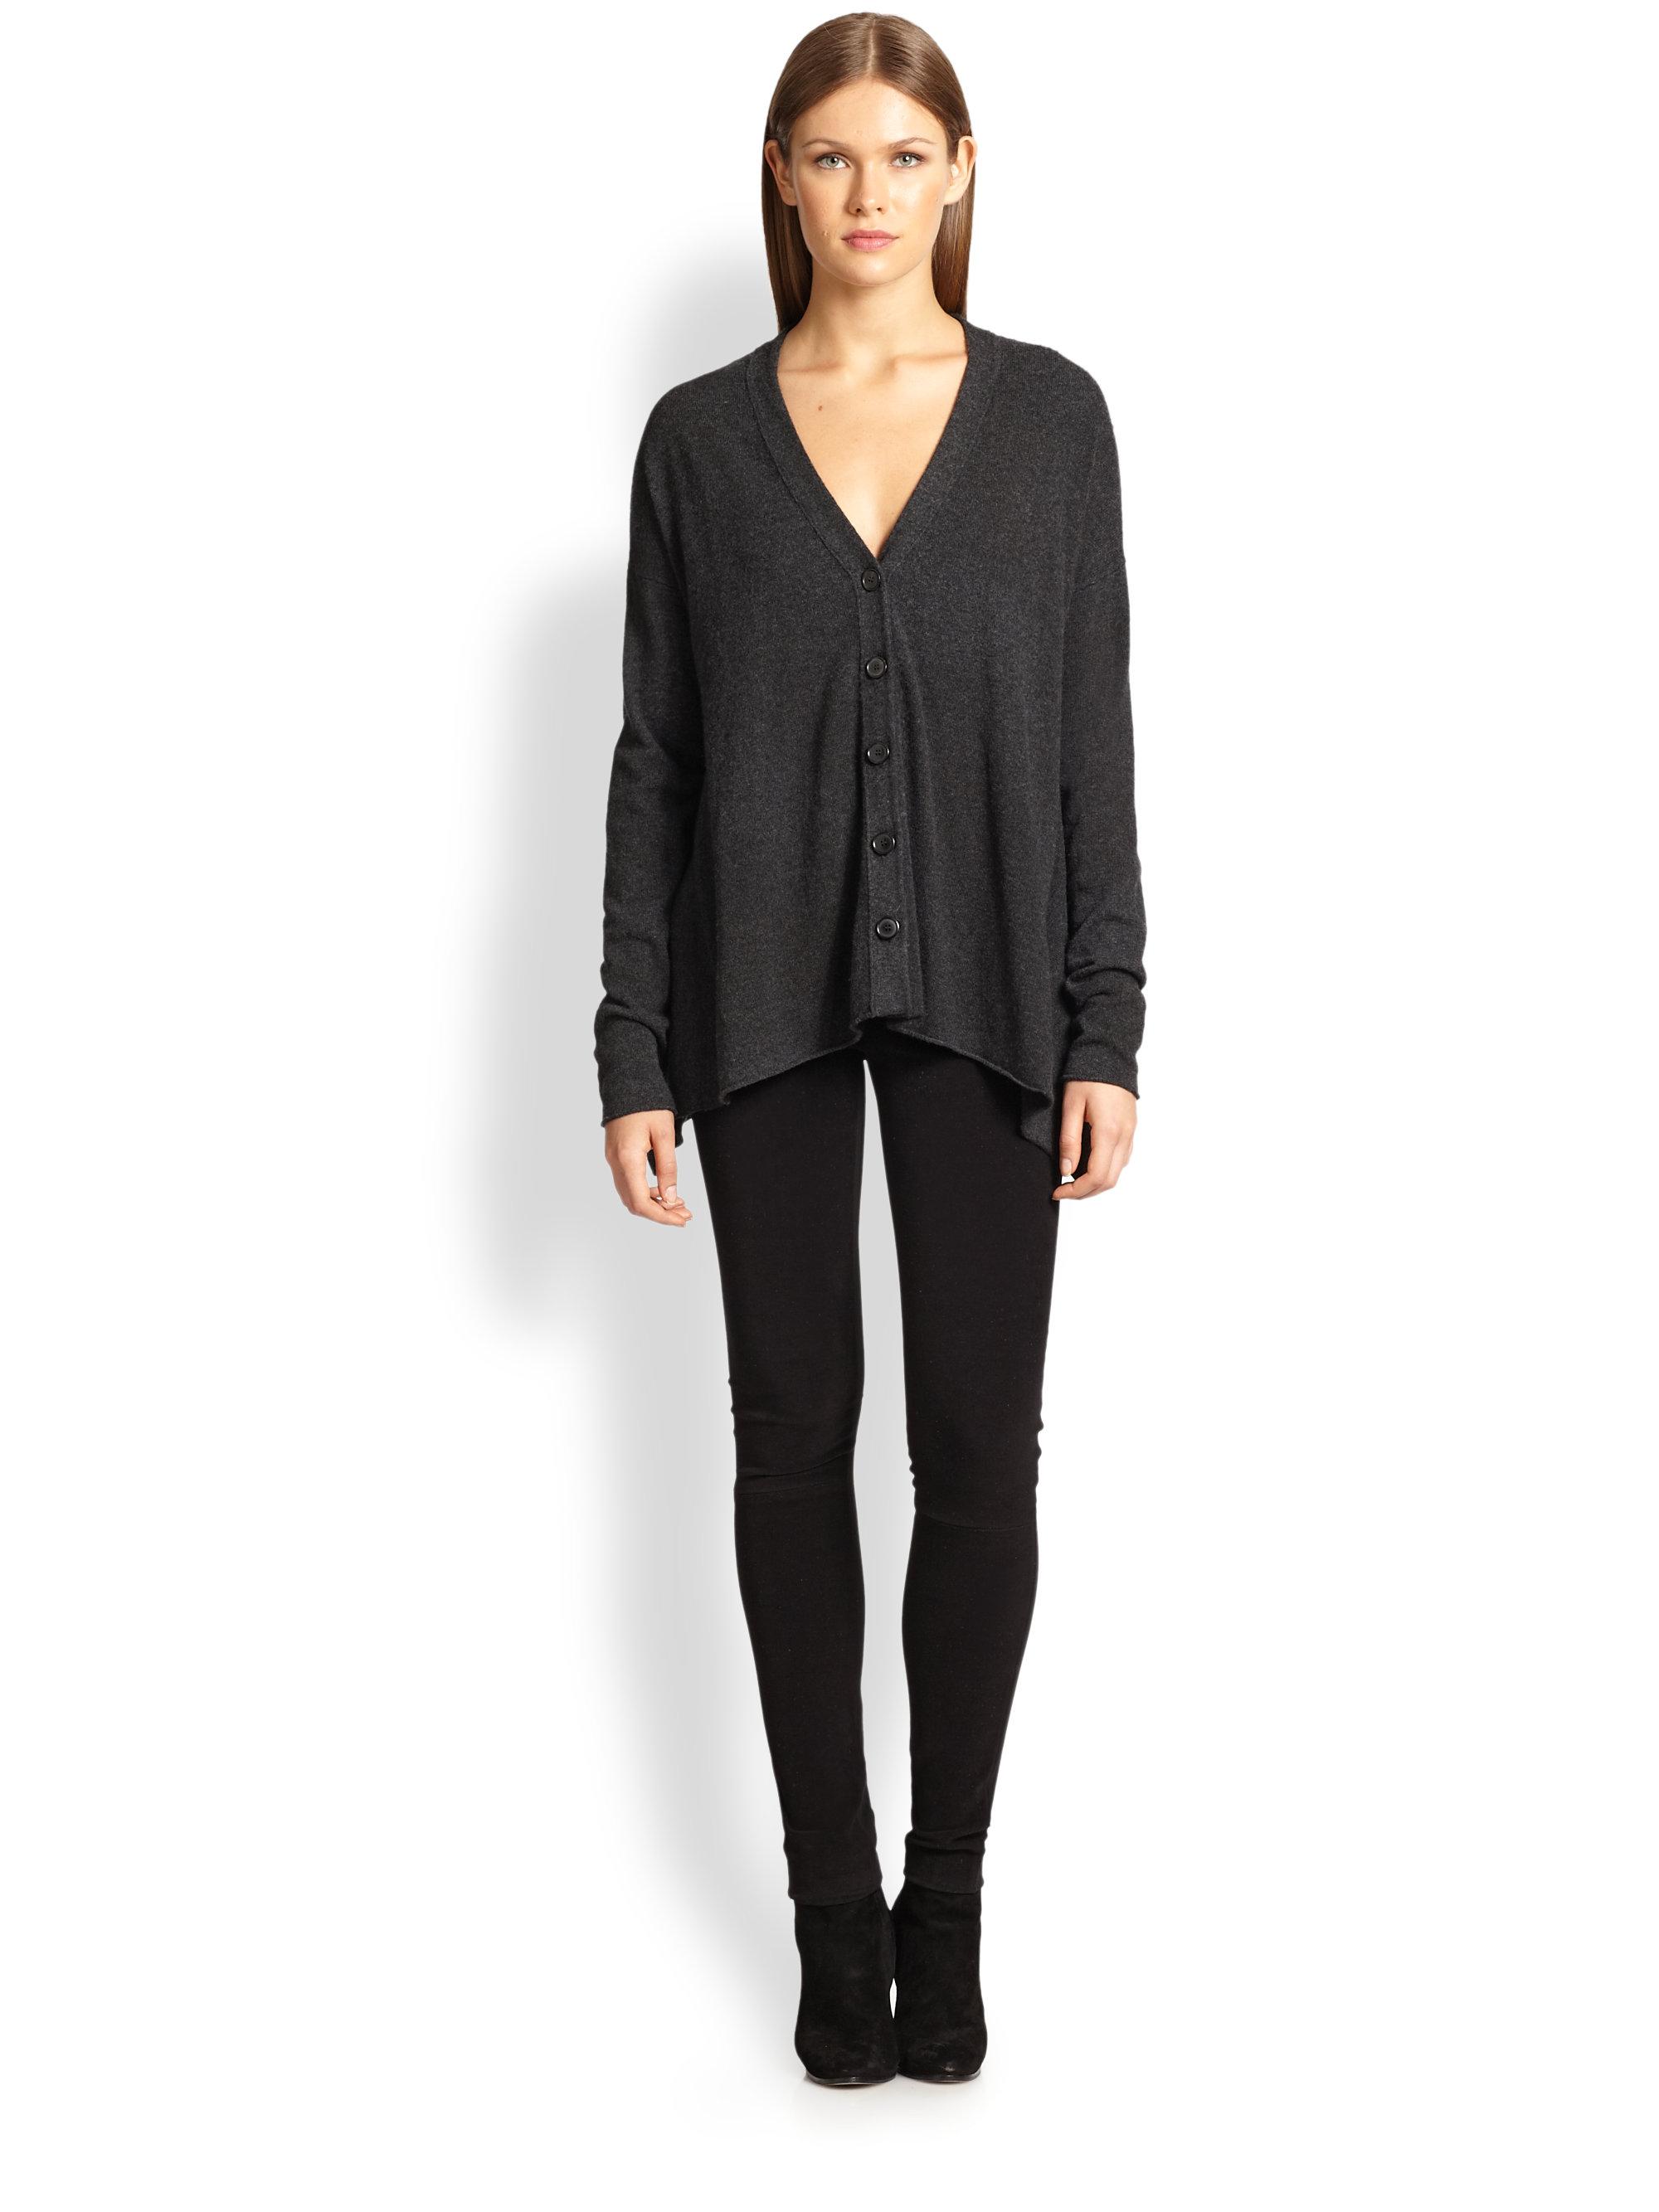 donna karan new york wool cashmere cardigan in gray. Black Bedroom Furniture Sets. Home Design Ideas